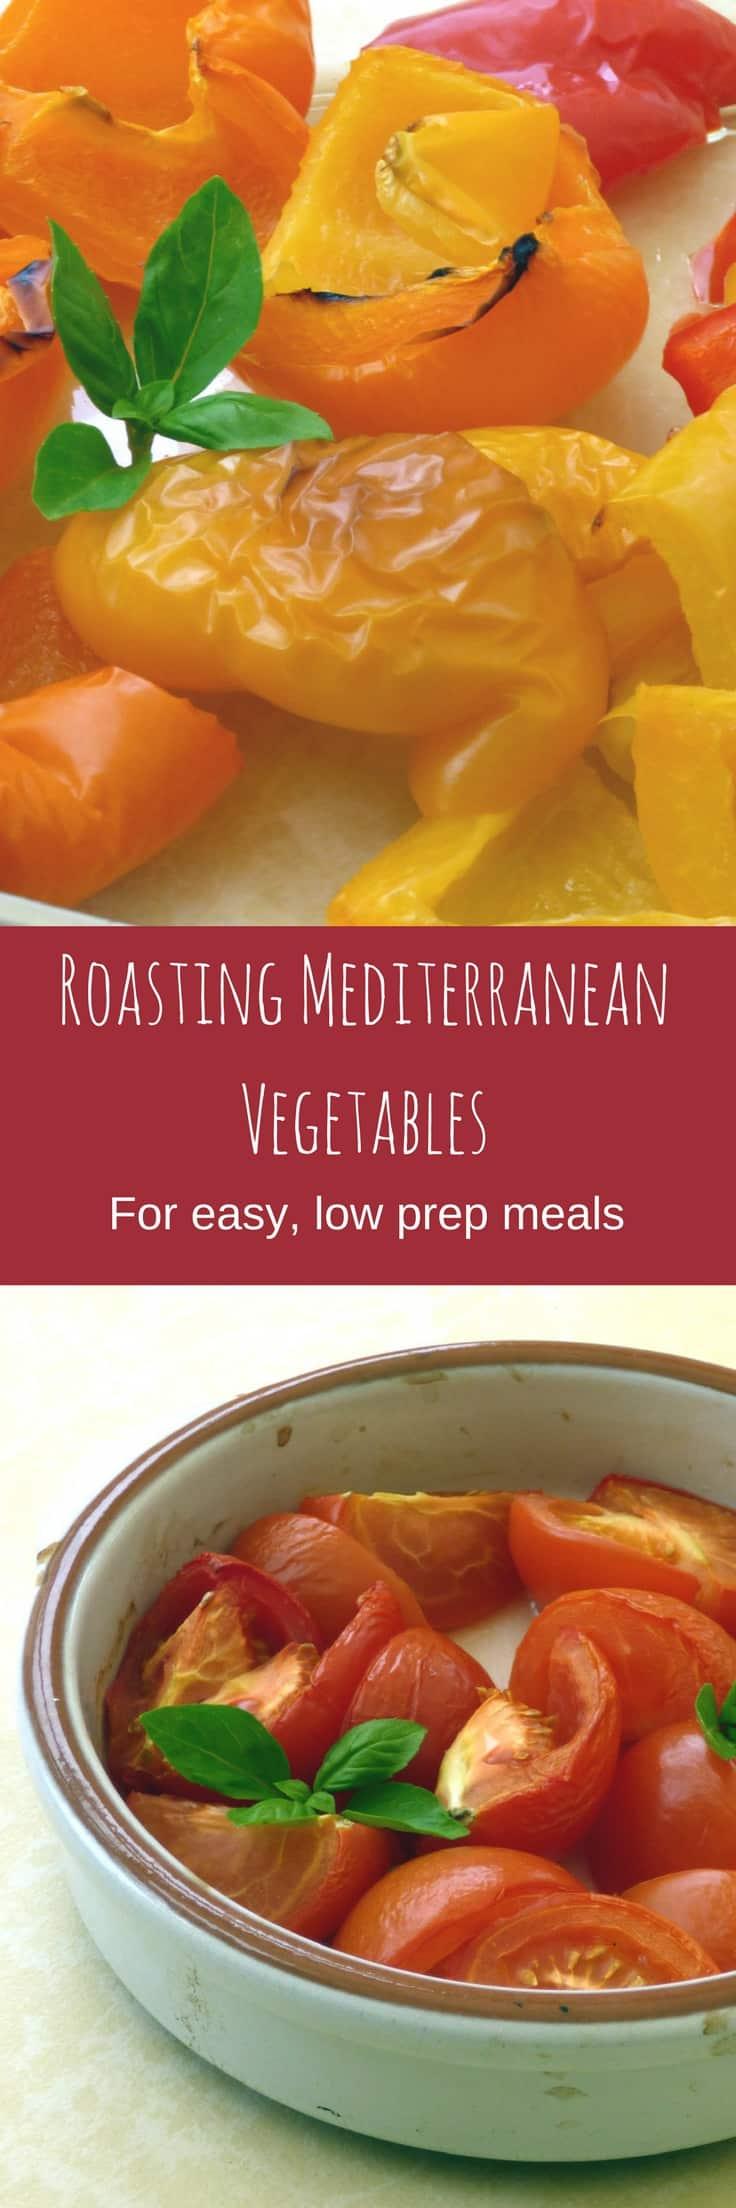 Collage of roasted mediterranean vegetables